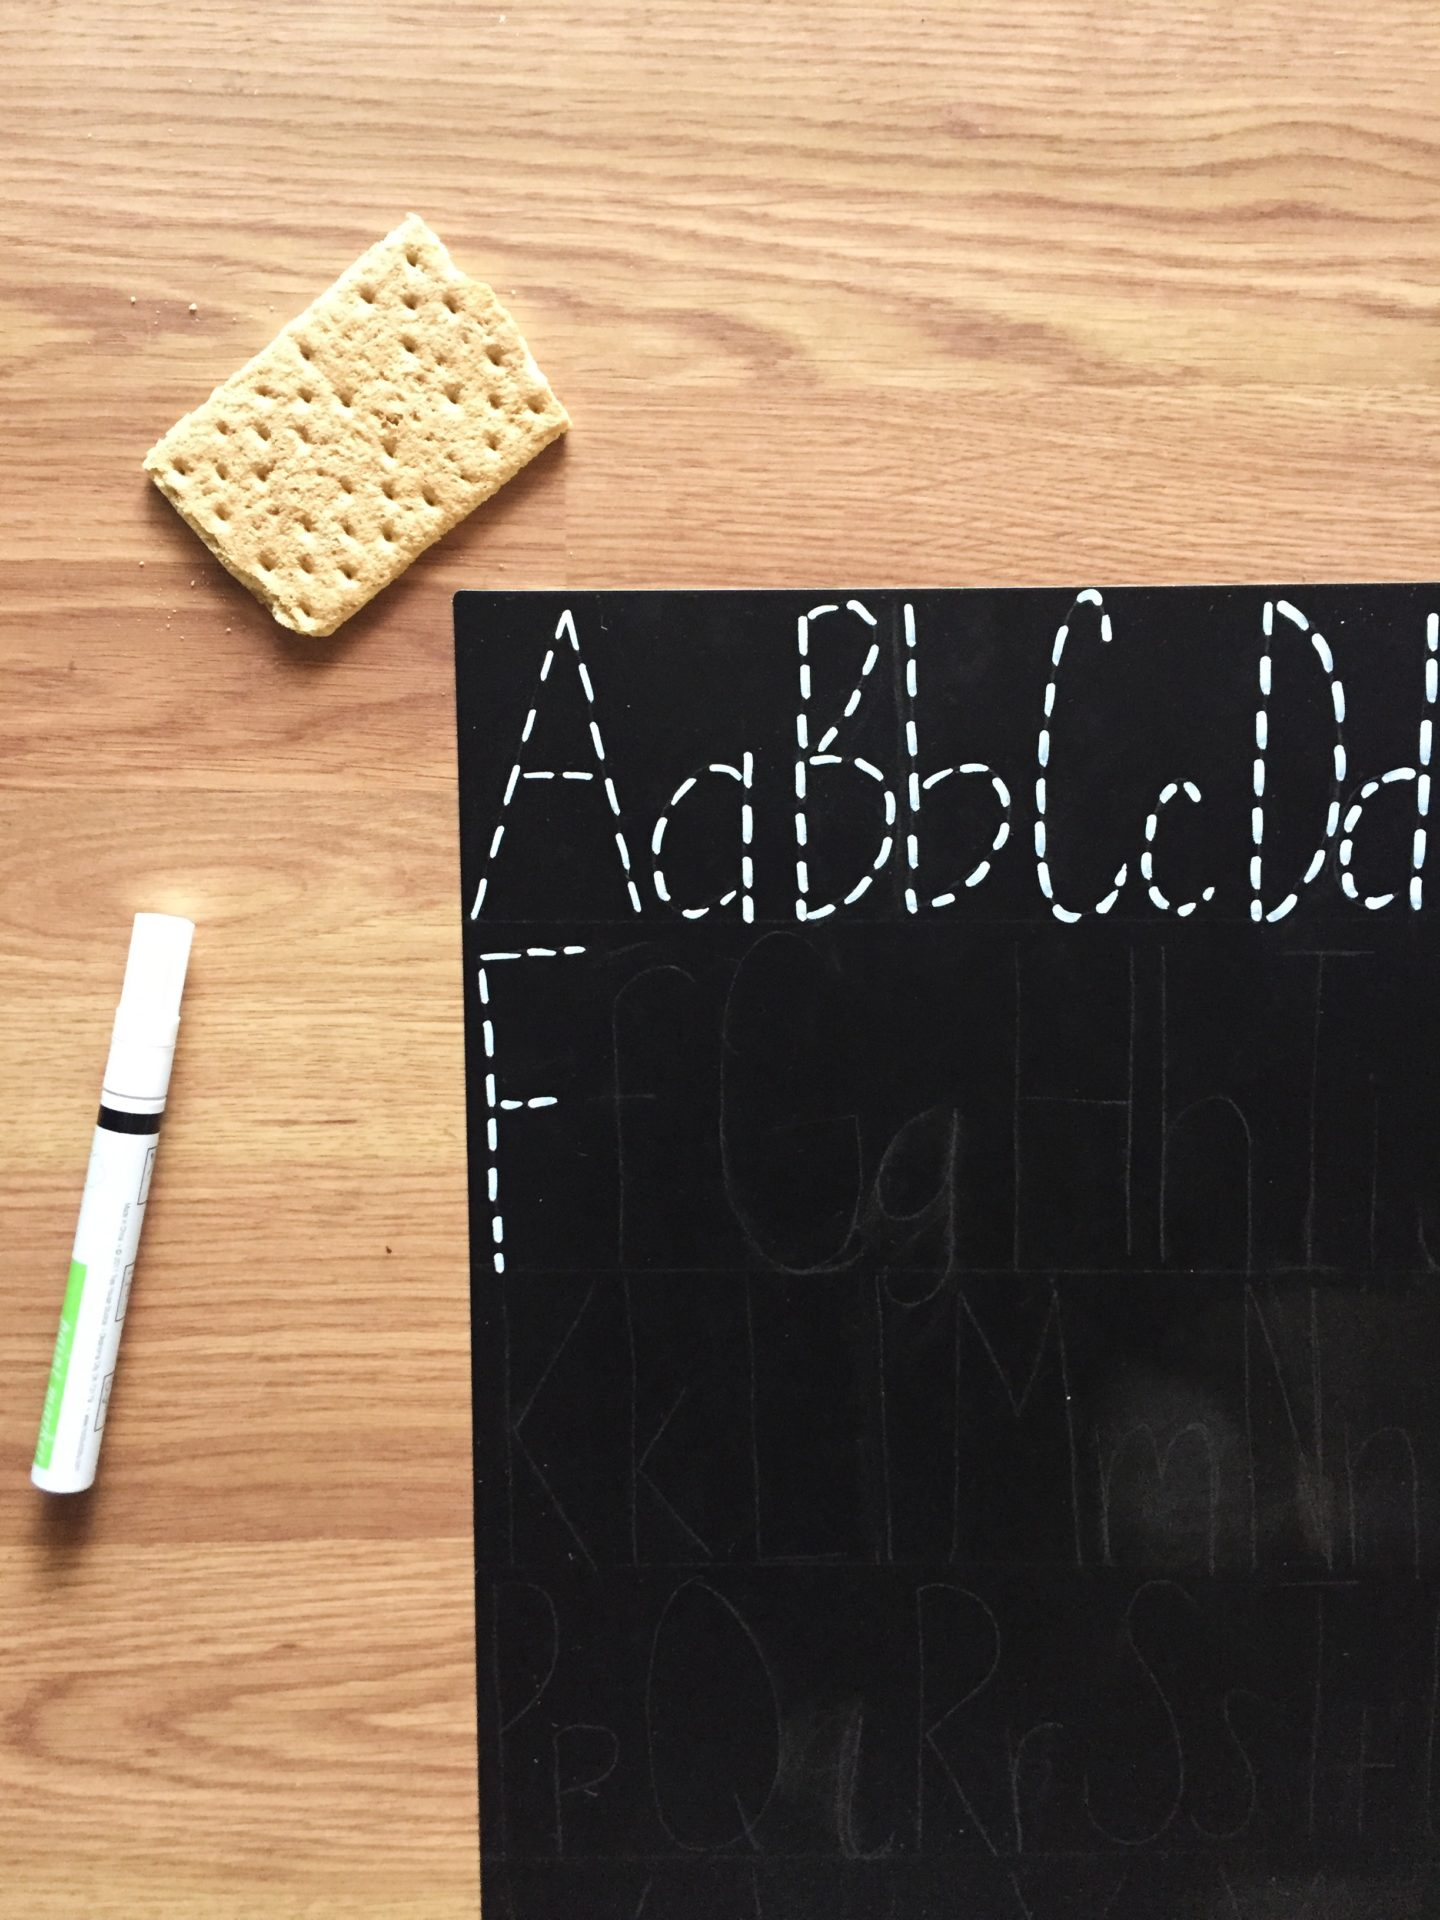 Letter Tracing Chalkboard Diy - Angela Cheatwood regarding Name Tracing Chalkboard